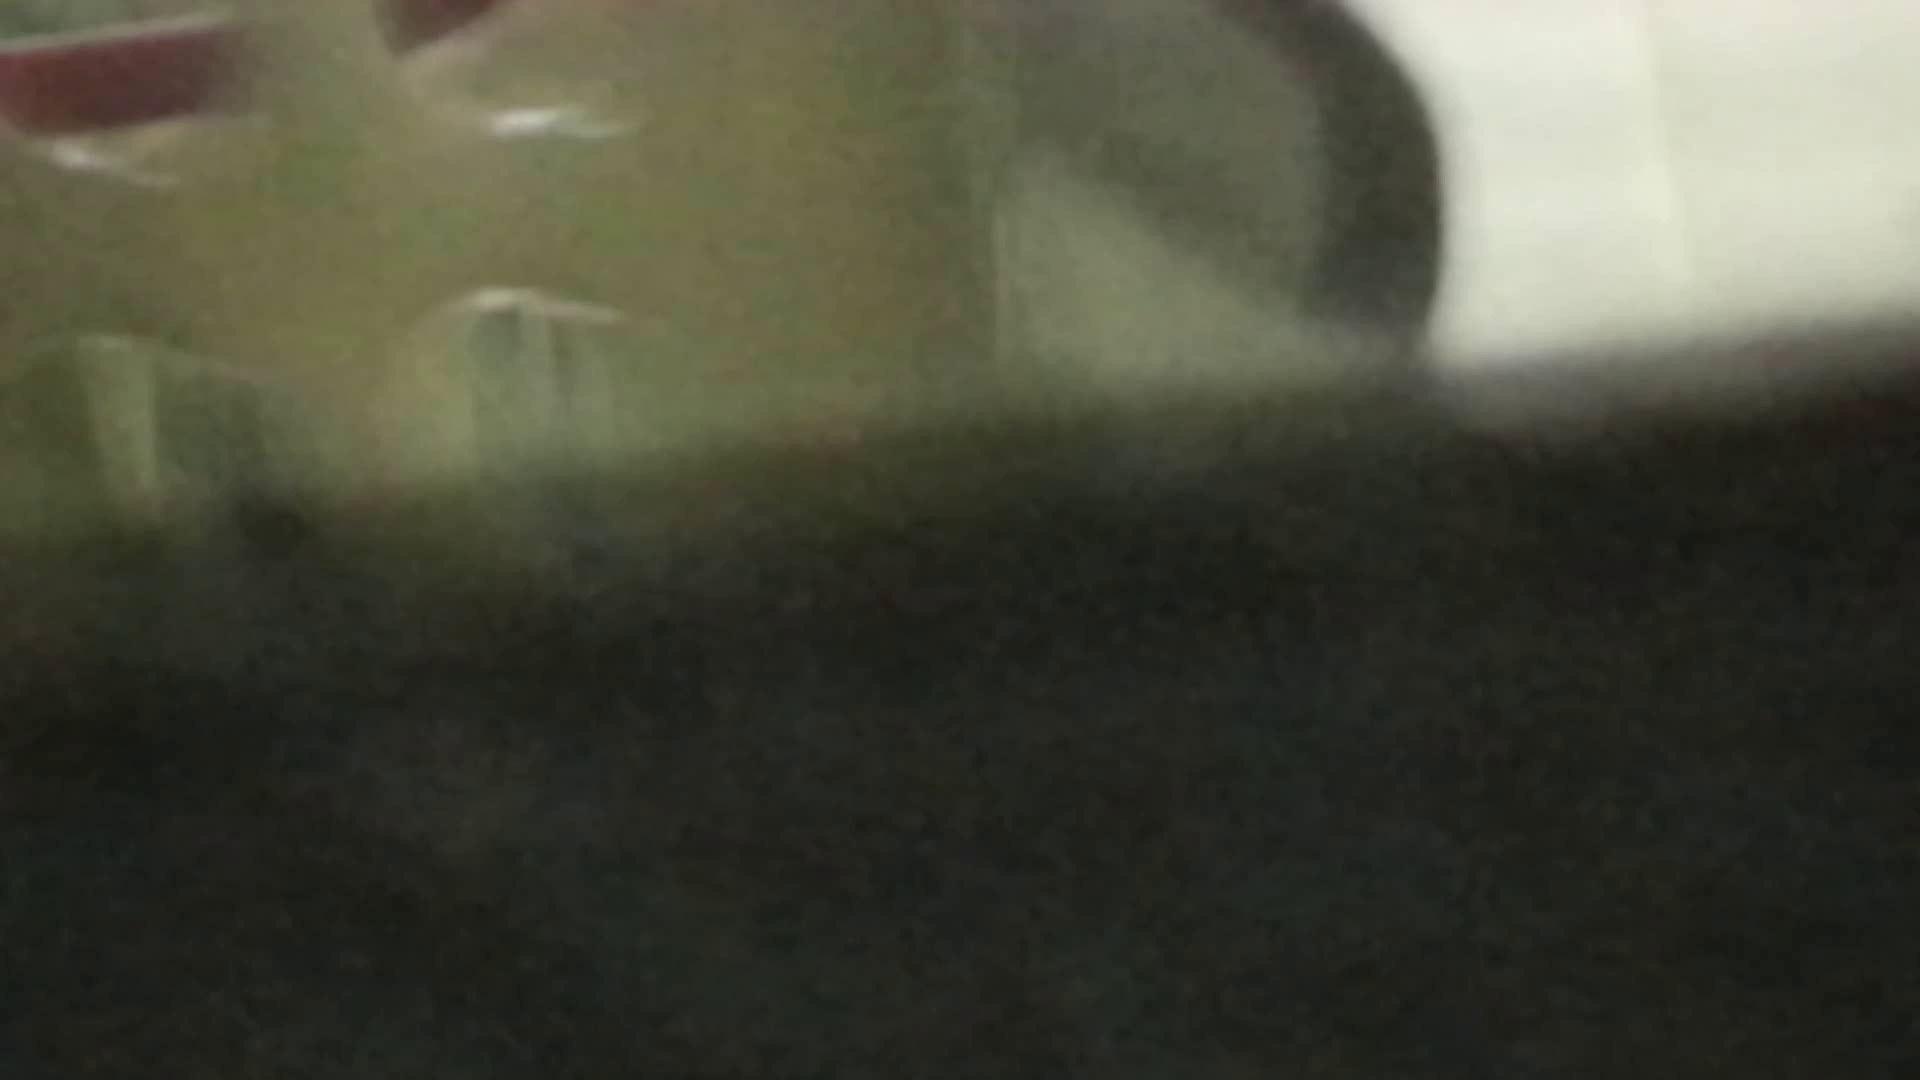 SPYさん初投稿!マンション覗き!5000K!ハイビジョン撮影VOL.05(元サッカー部員社会人) ノンケのオナニー ゲイエロ動画 75連発 58